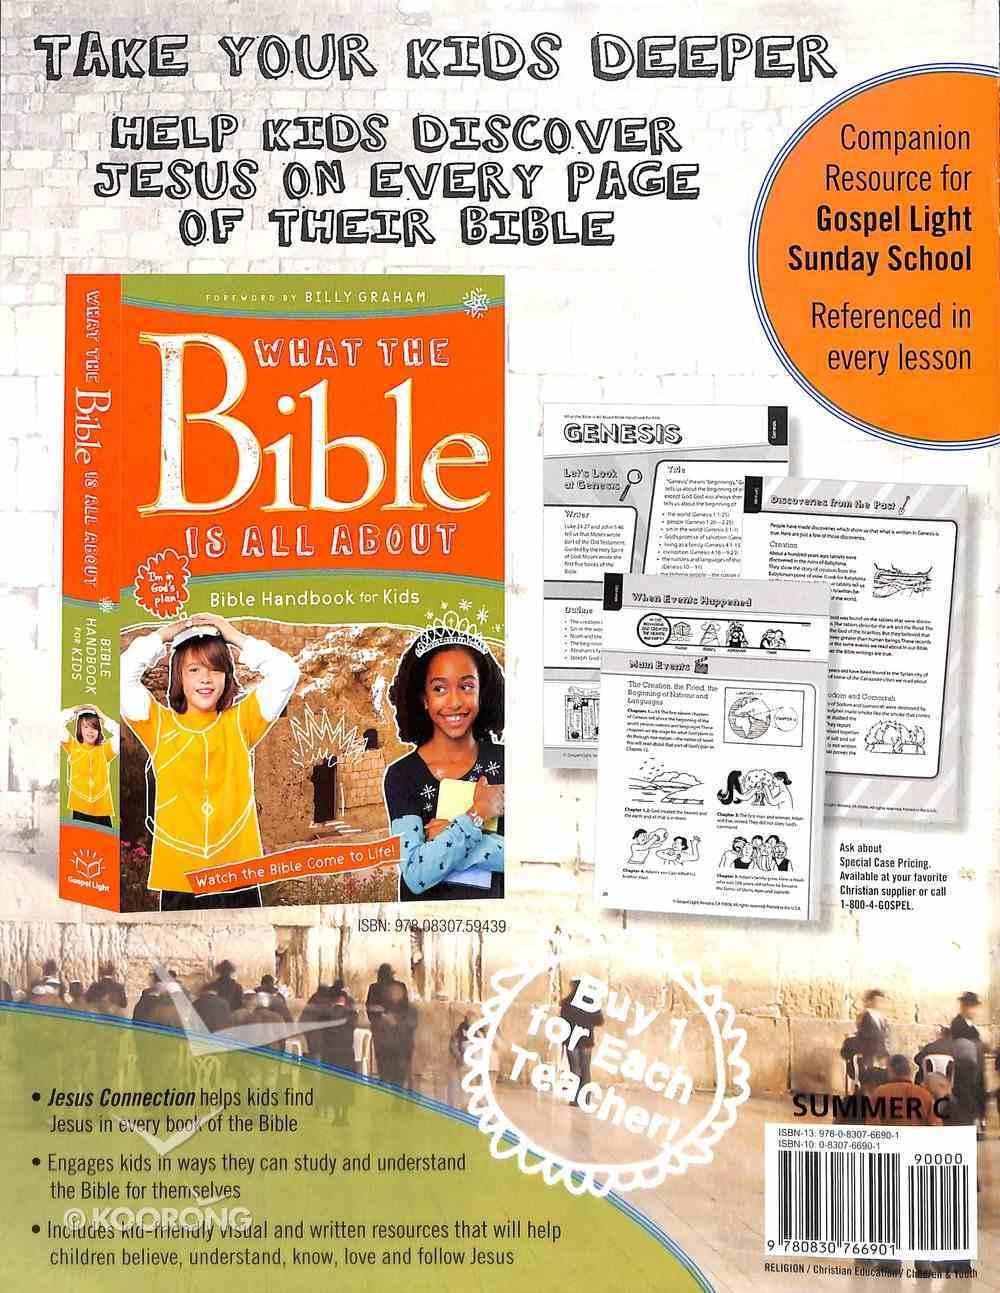 Gllw Summerc 2018/2019 Ages 6-10 Bible Teaching Poster Pack Grades 1-4 (Year C) (Gospel Light Living Word Series) Pack